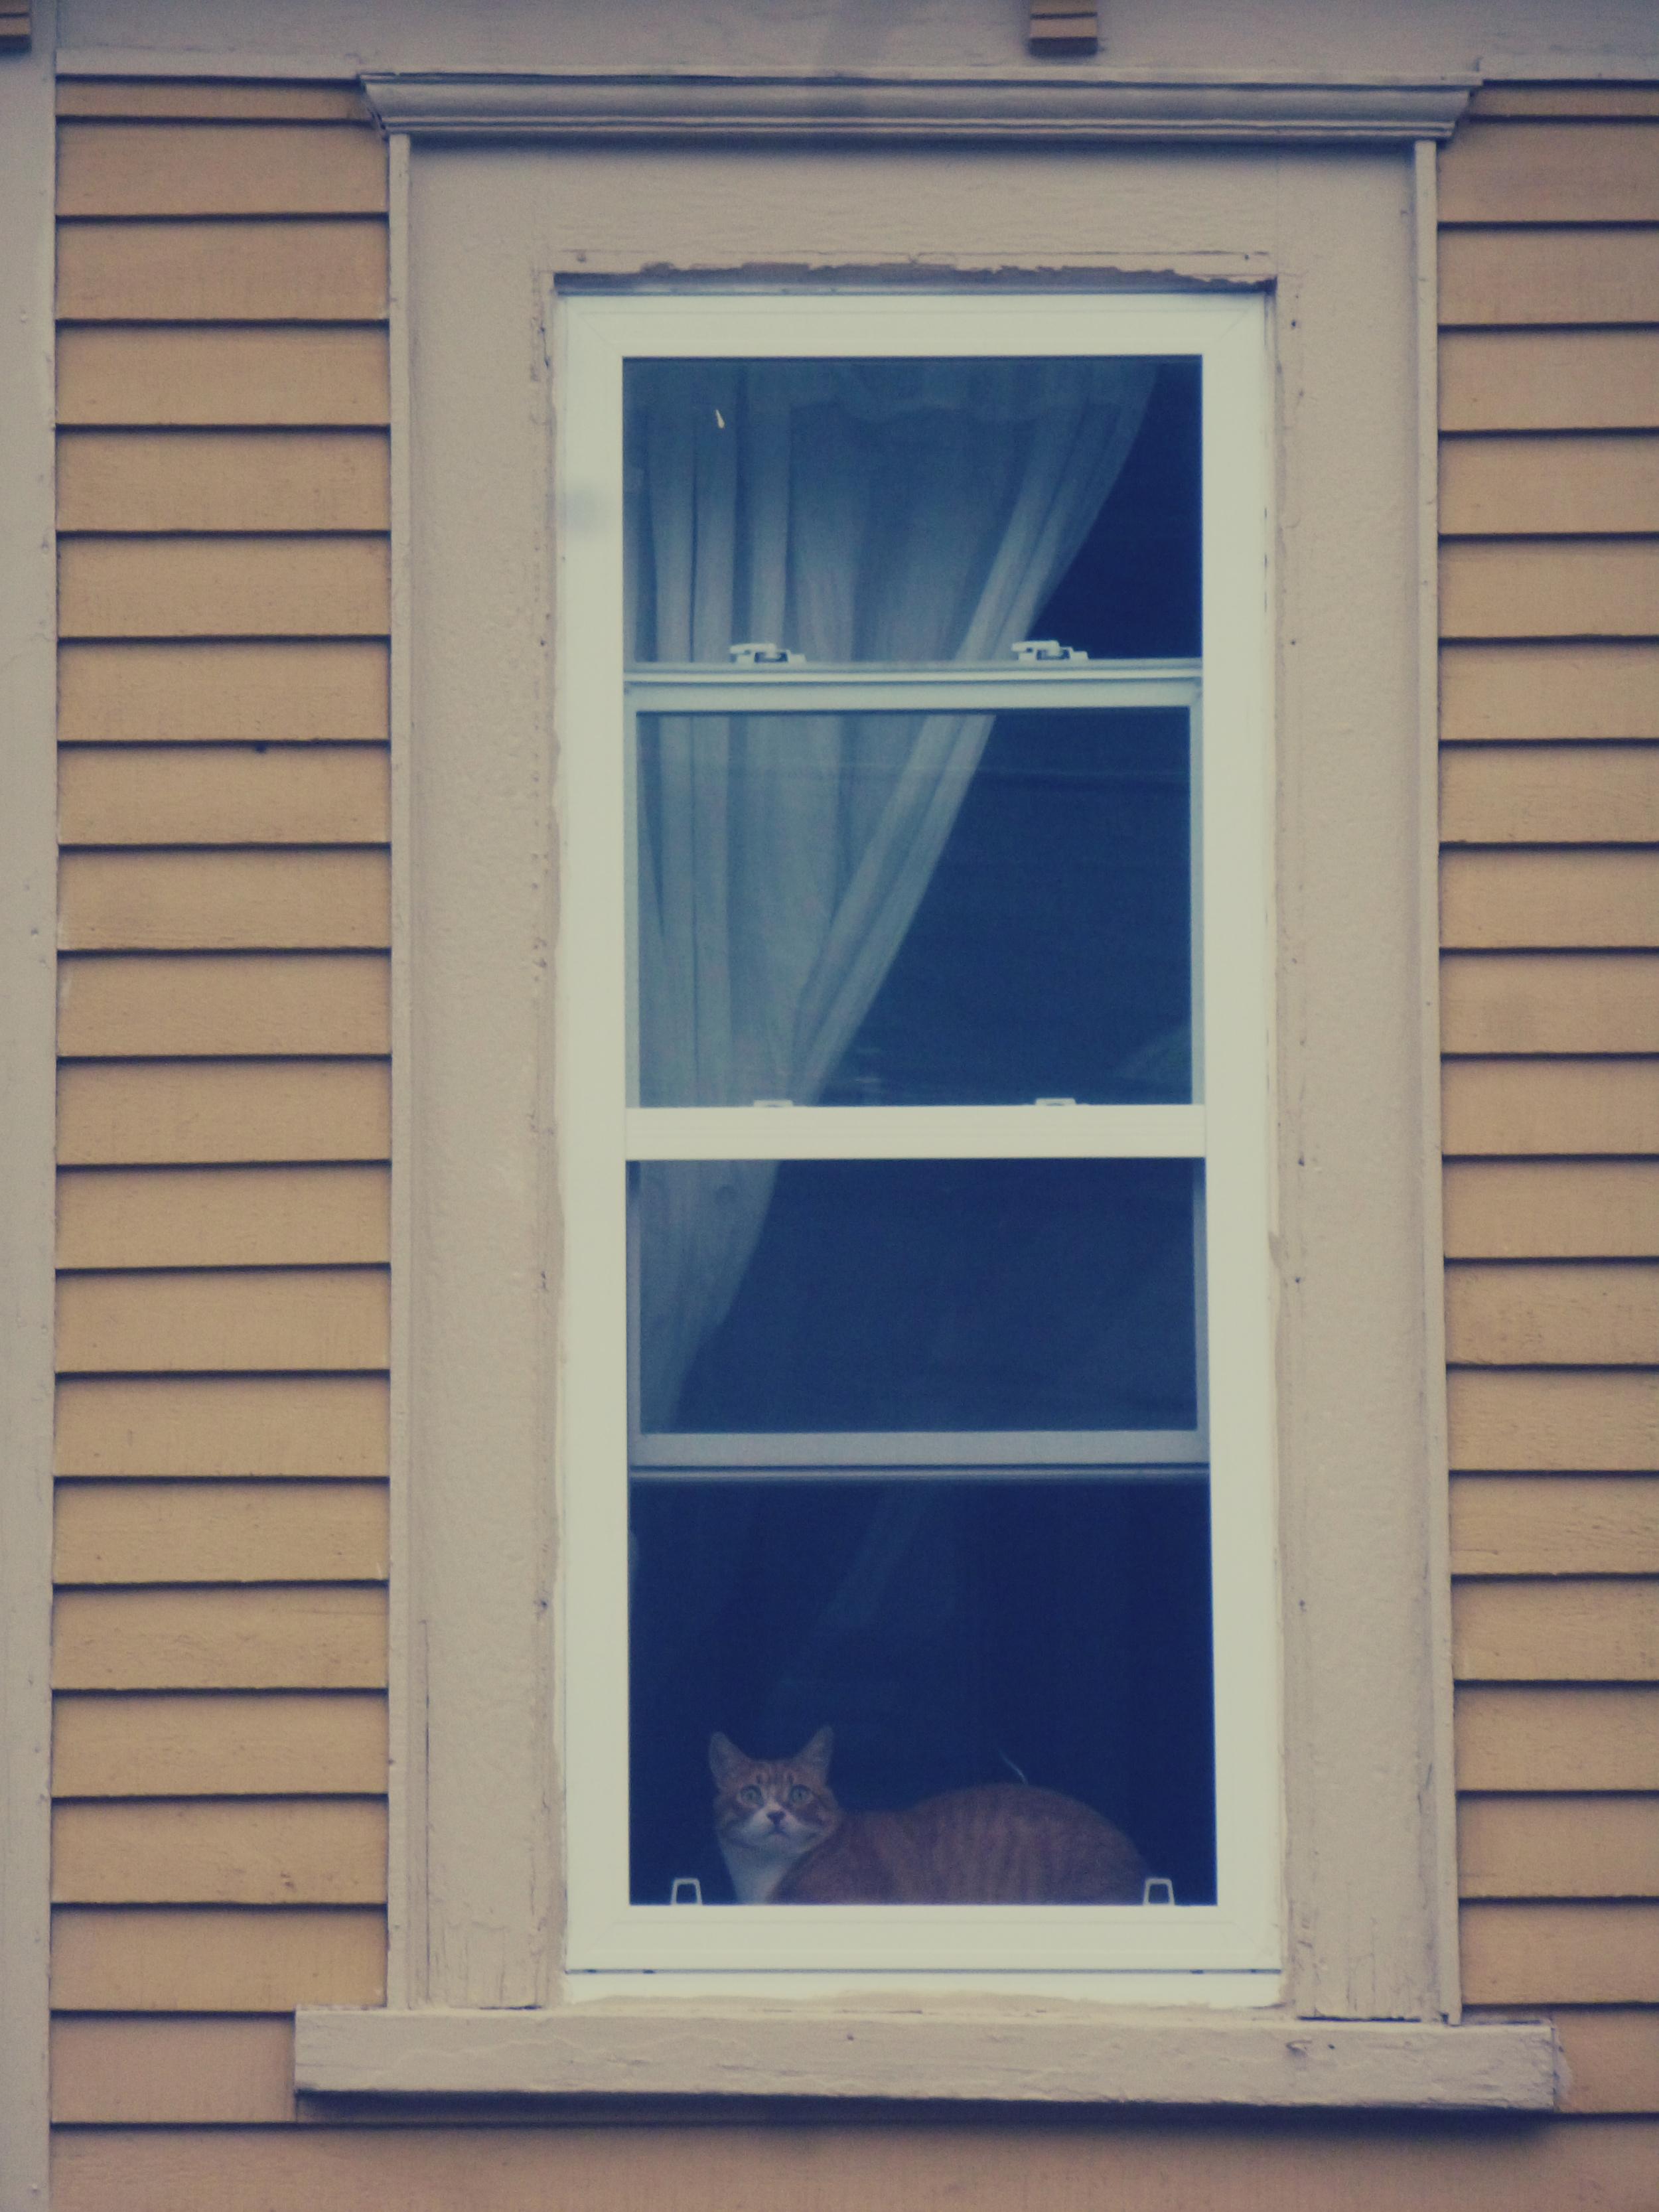 Window with Tom Cat